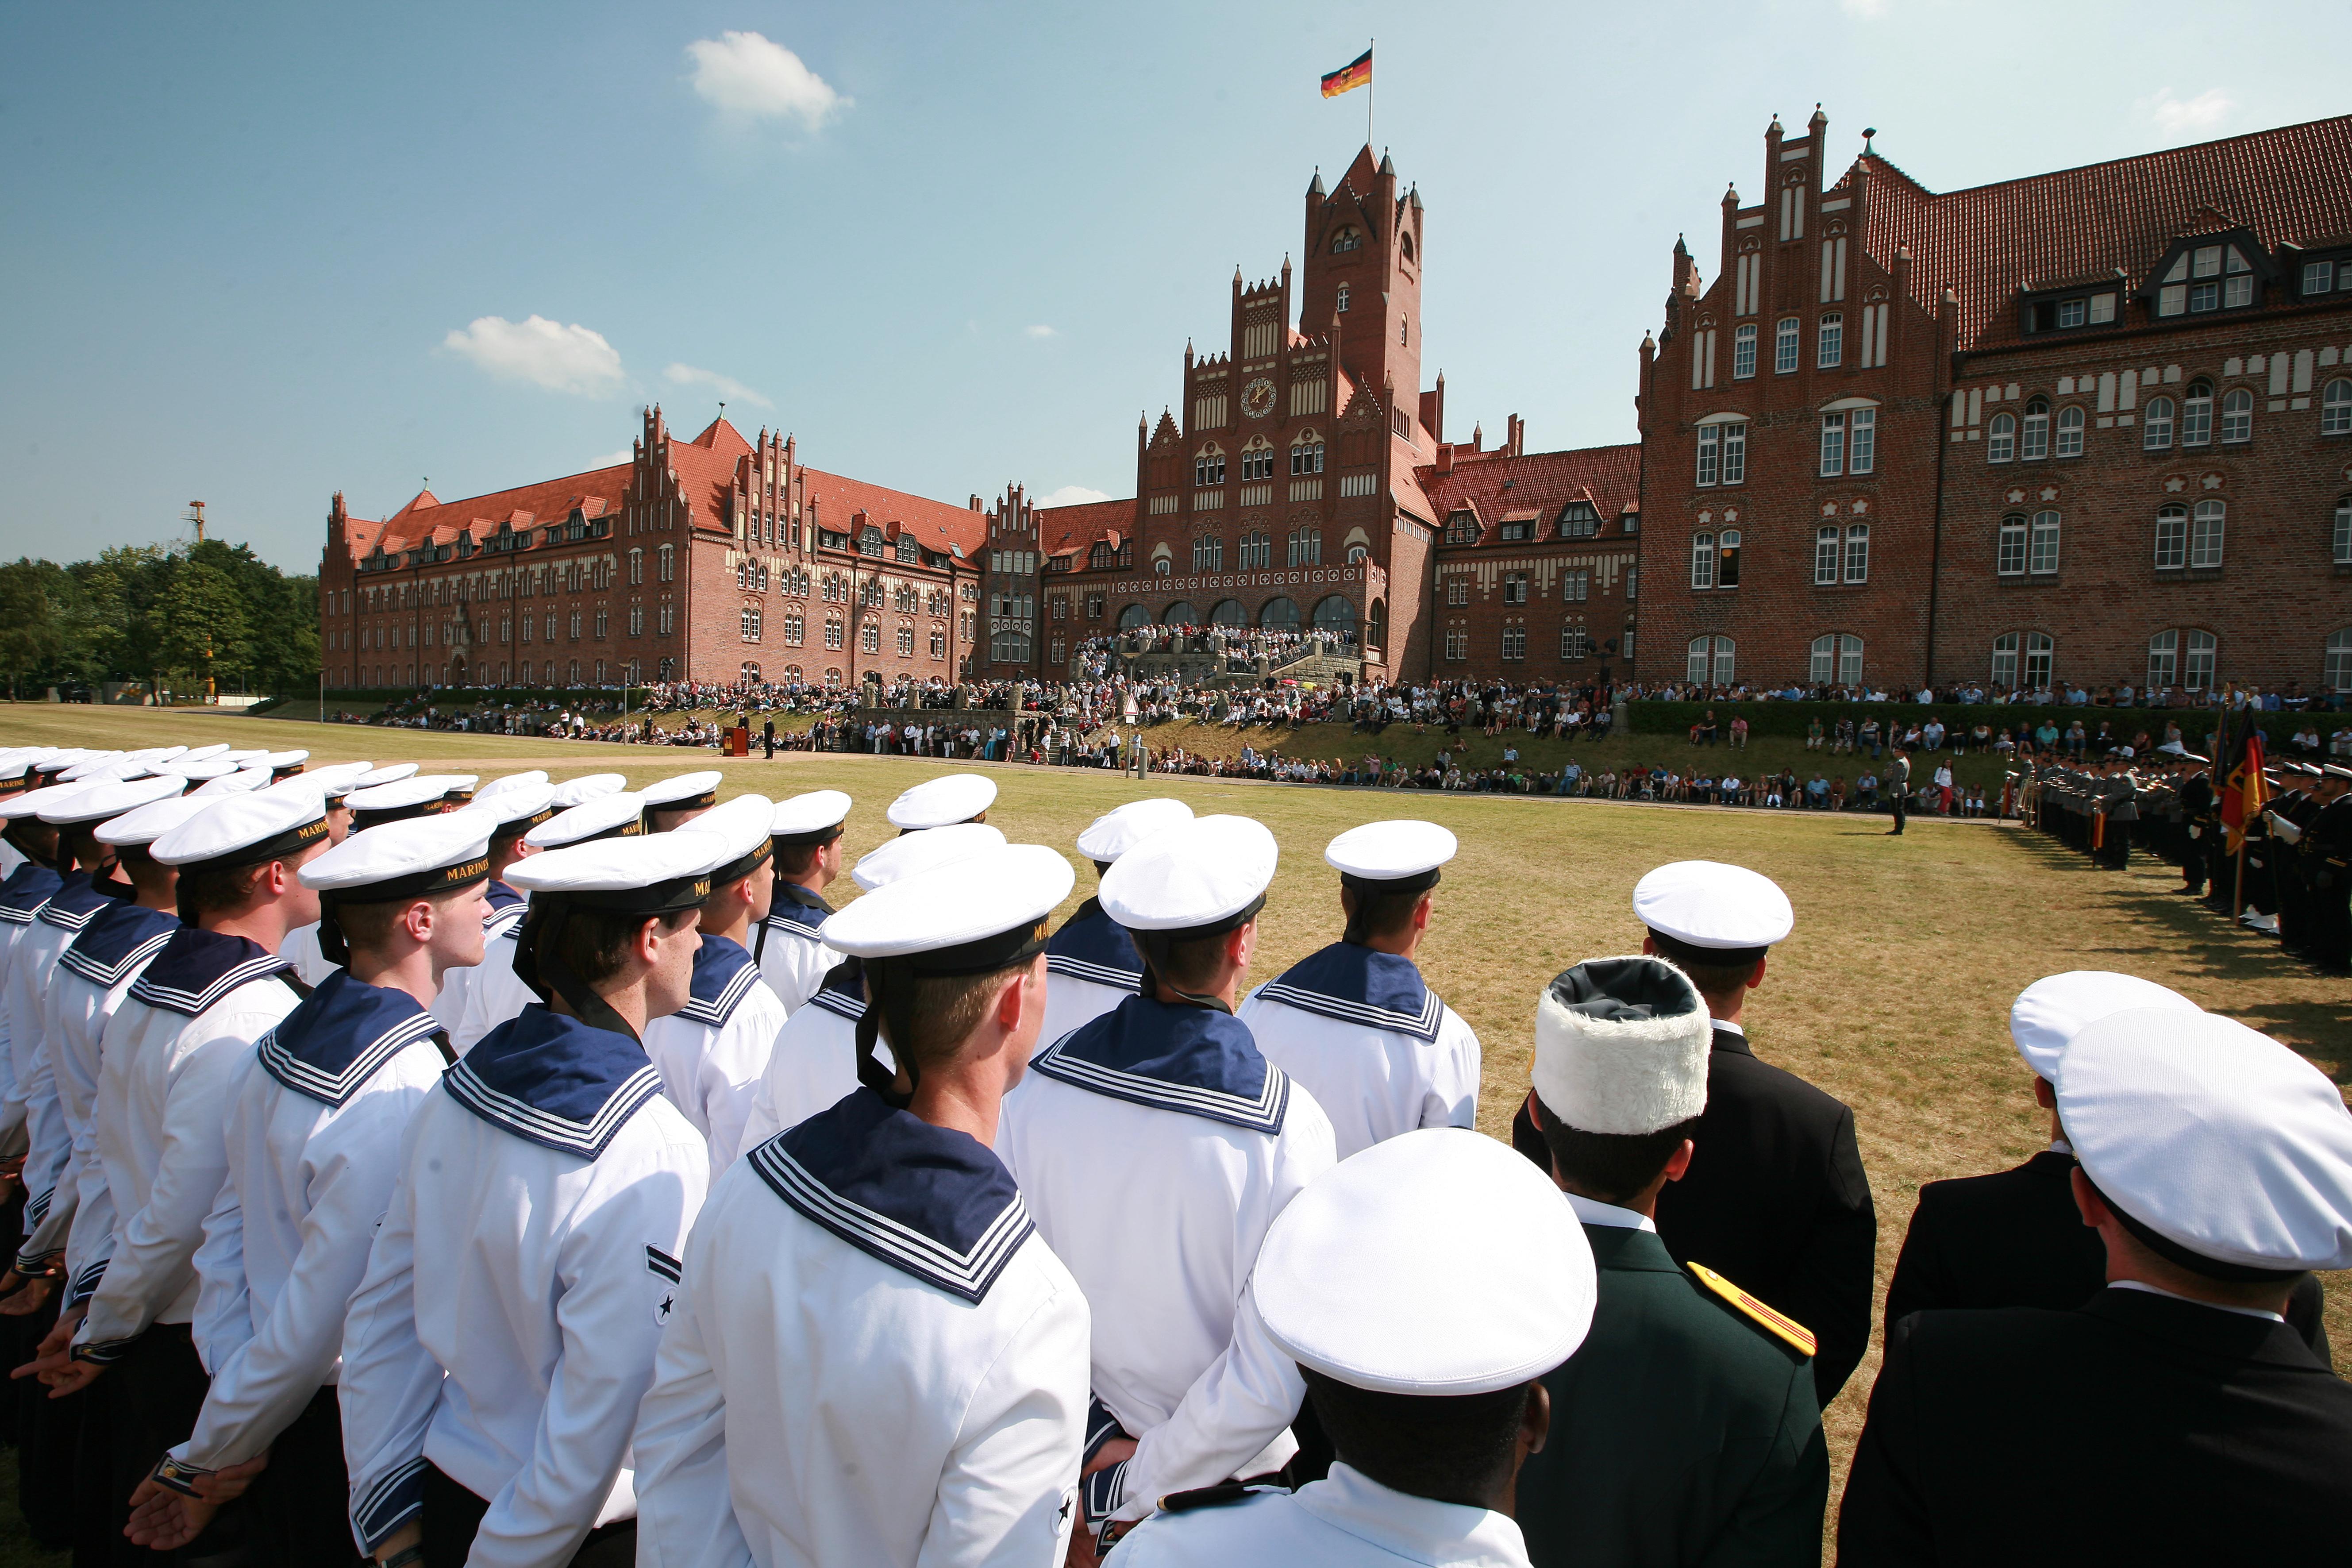 Marineschule flensburg